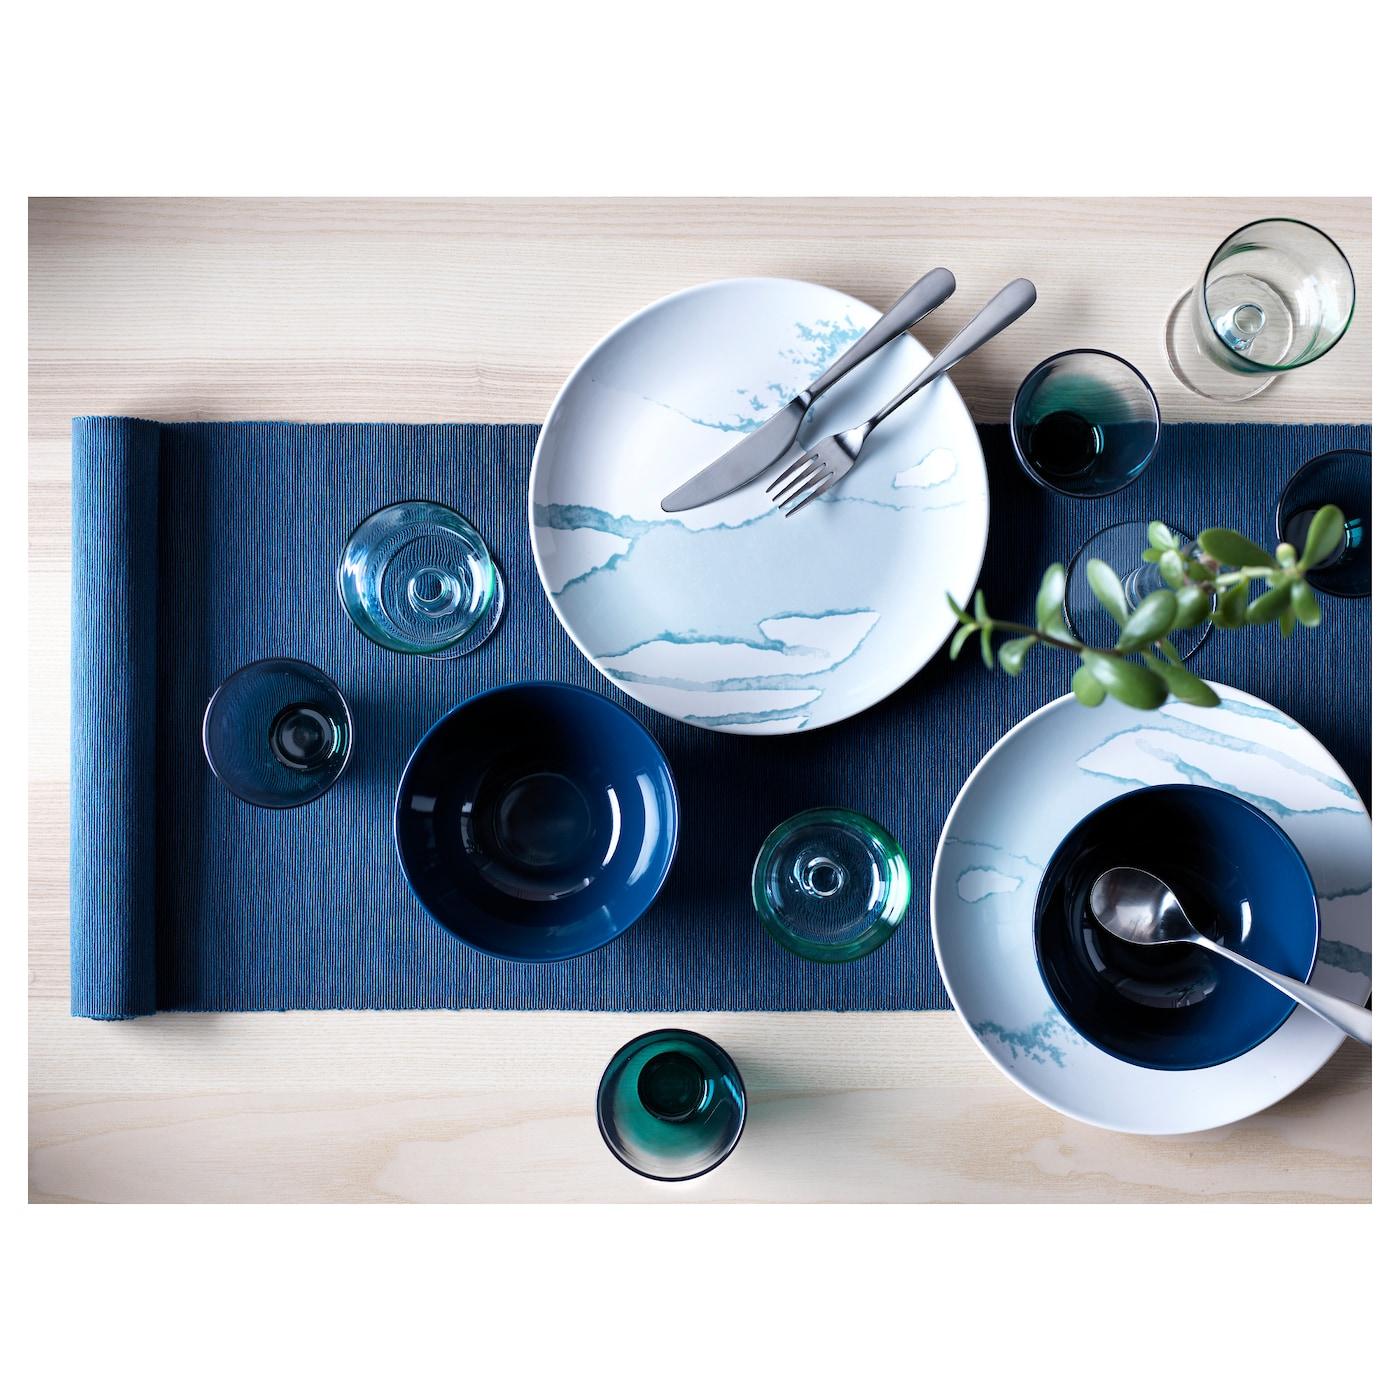 m rit chemin de table bleu fonc 35x130 cm ikea. Black Bedroom Furniture Sets. Home Design Ideas